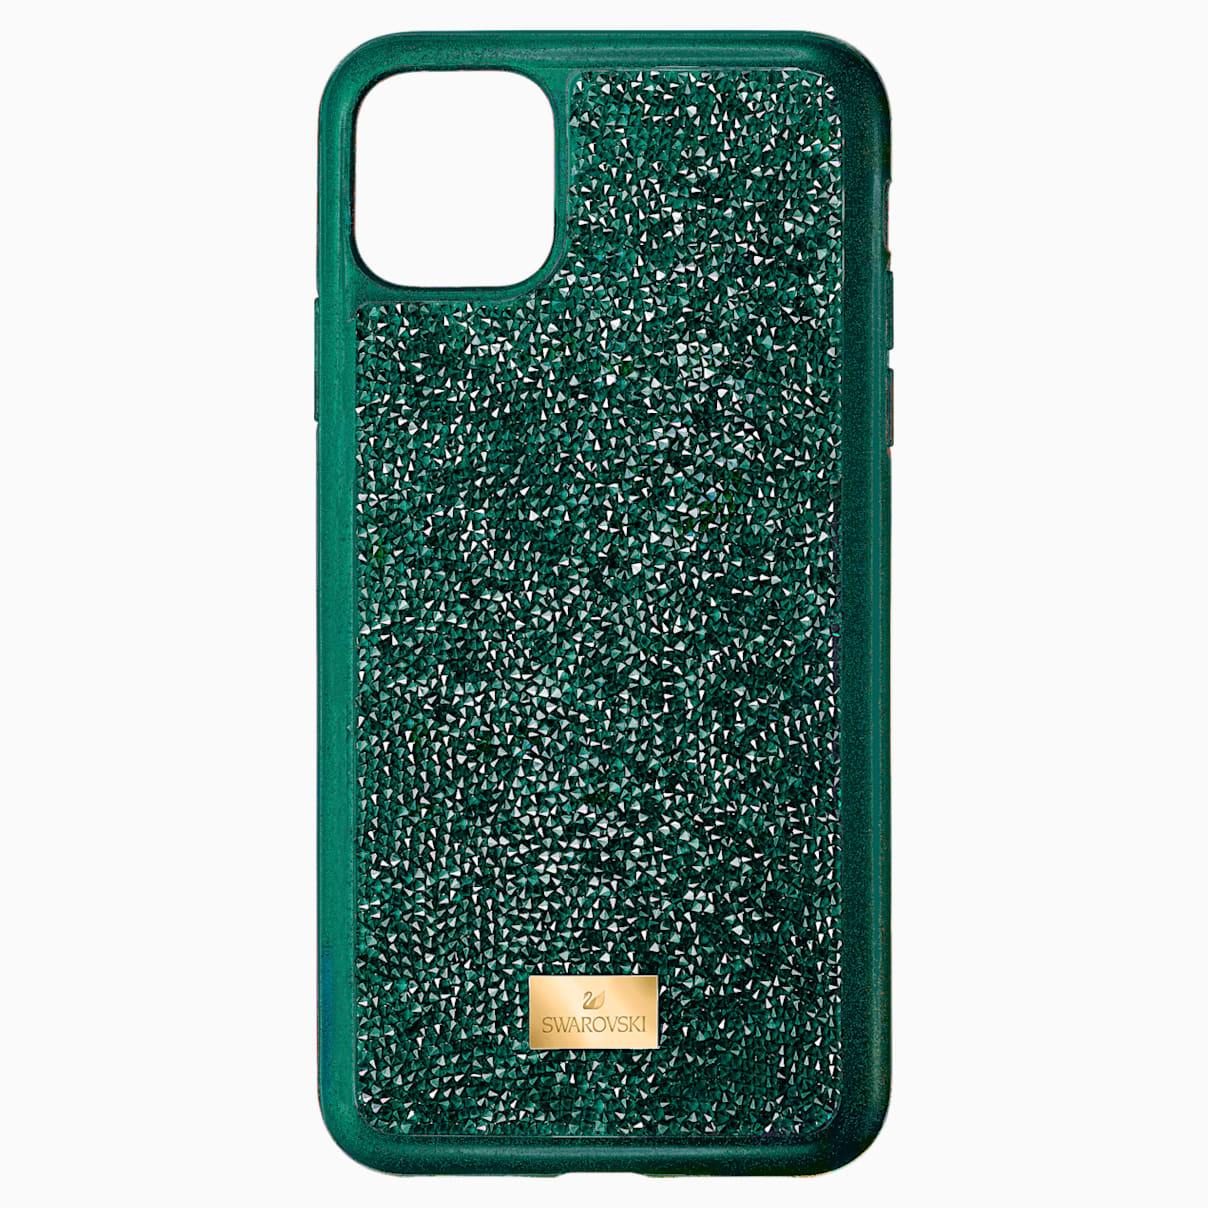 Swarovski Glam Rock Smartphone case with bumper, iPhone® 11 Pro Max, Green